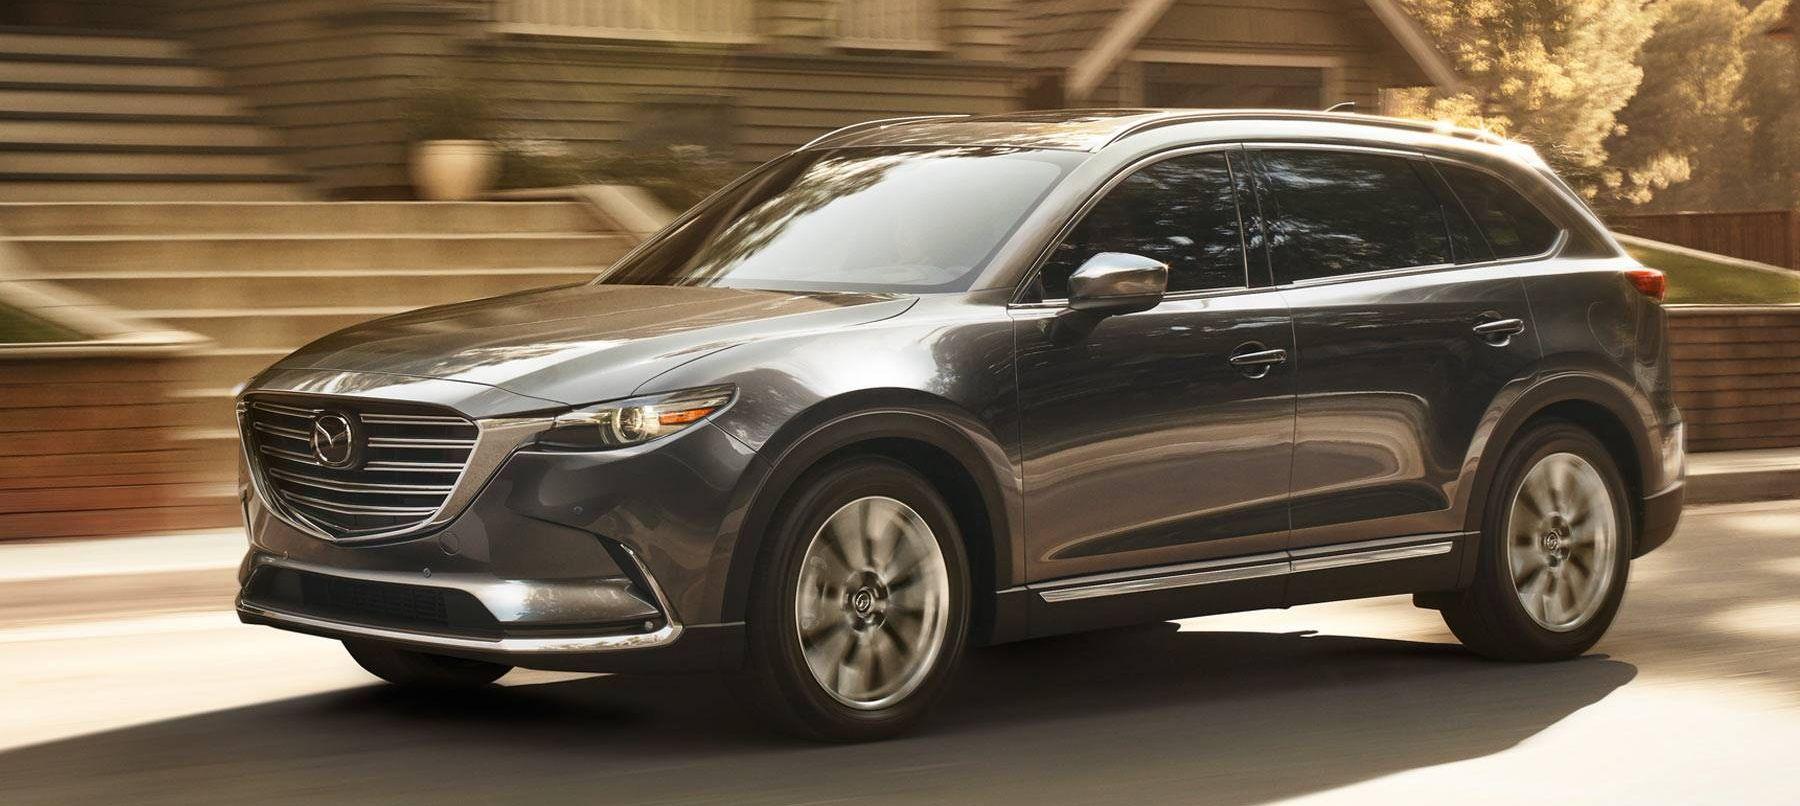 2018 Mazda CX-9 for Sale near Friendswood, TX